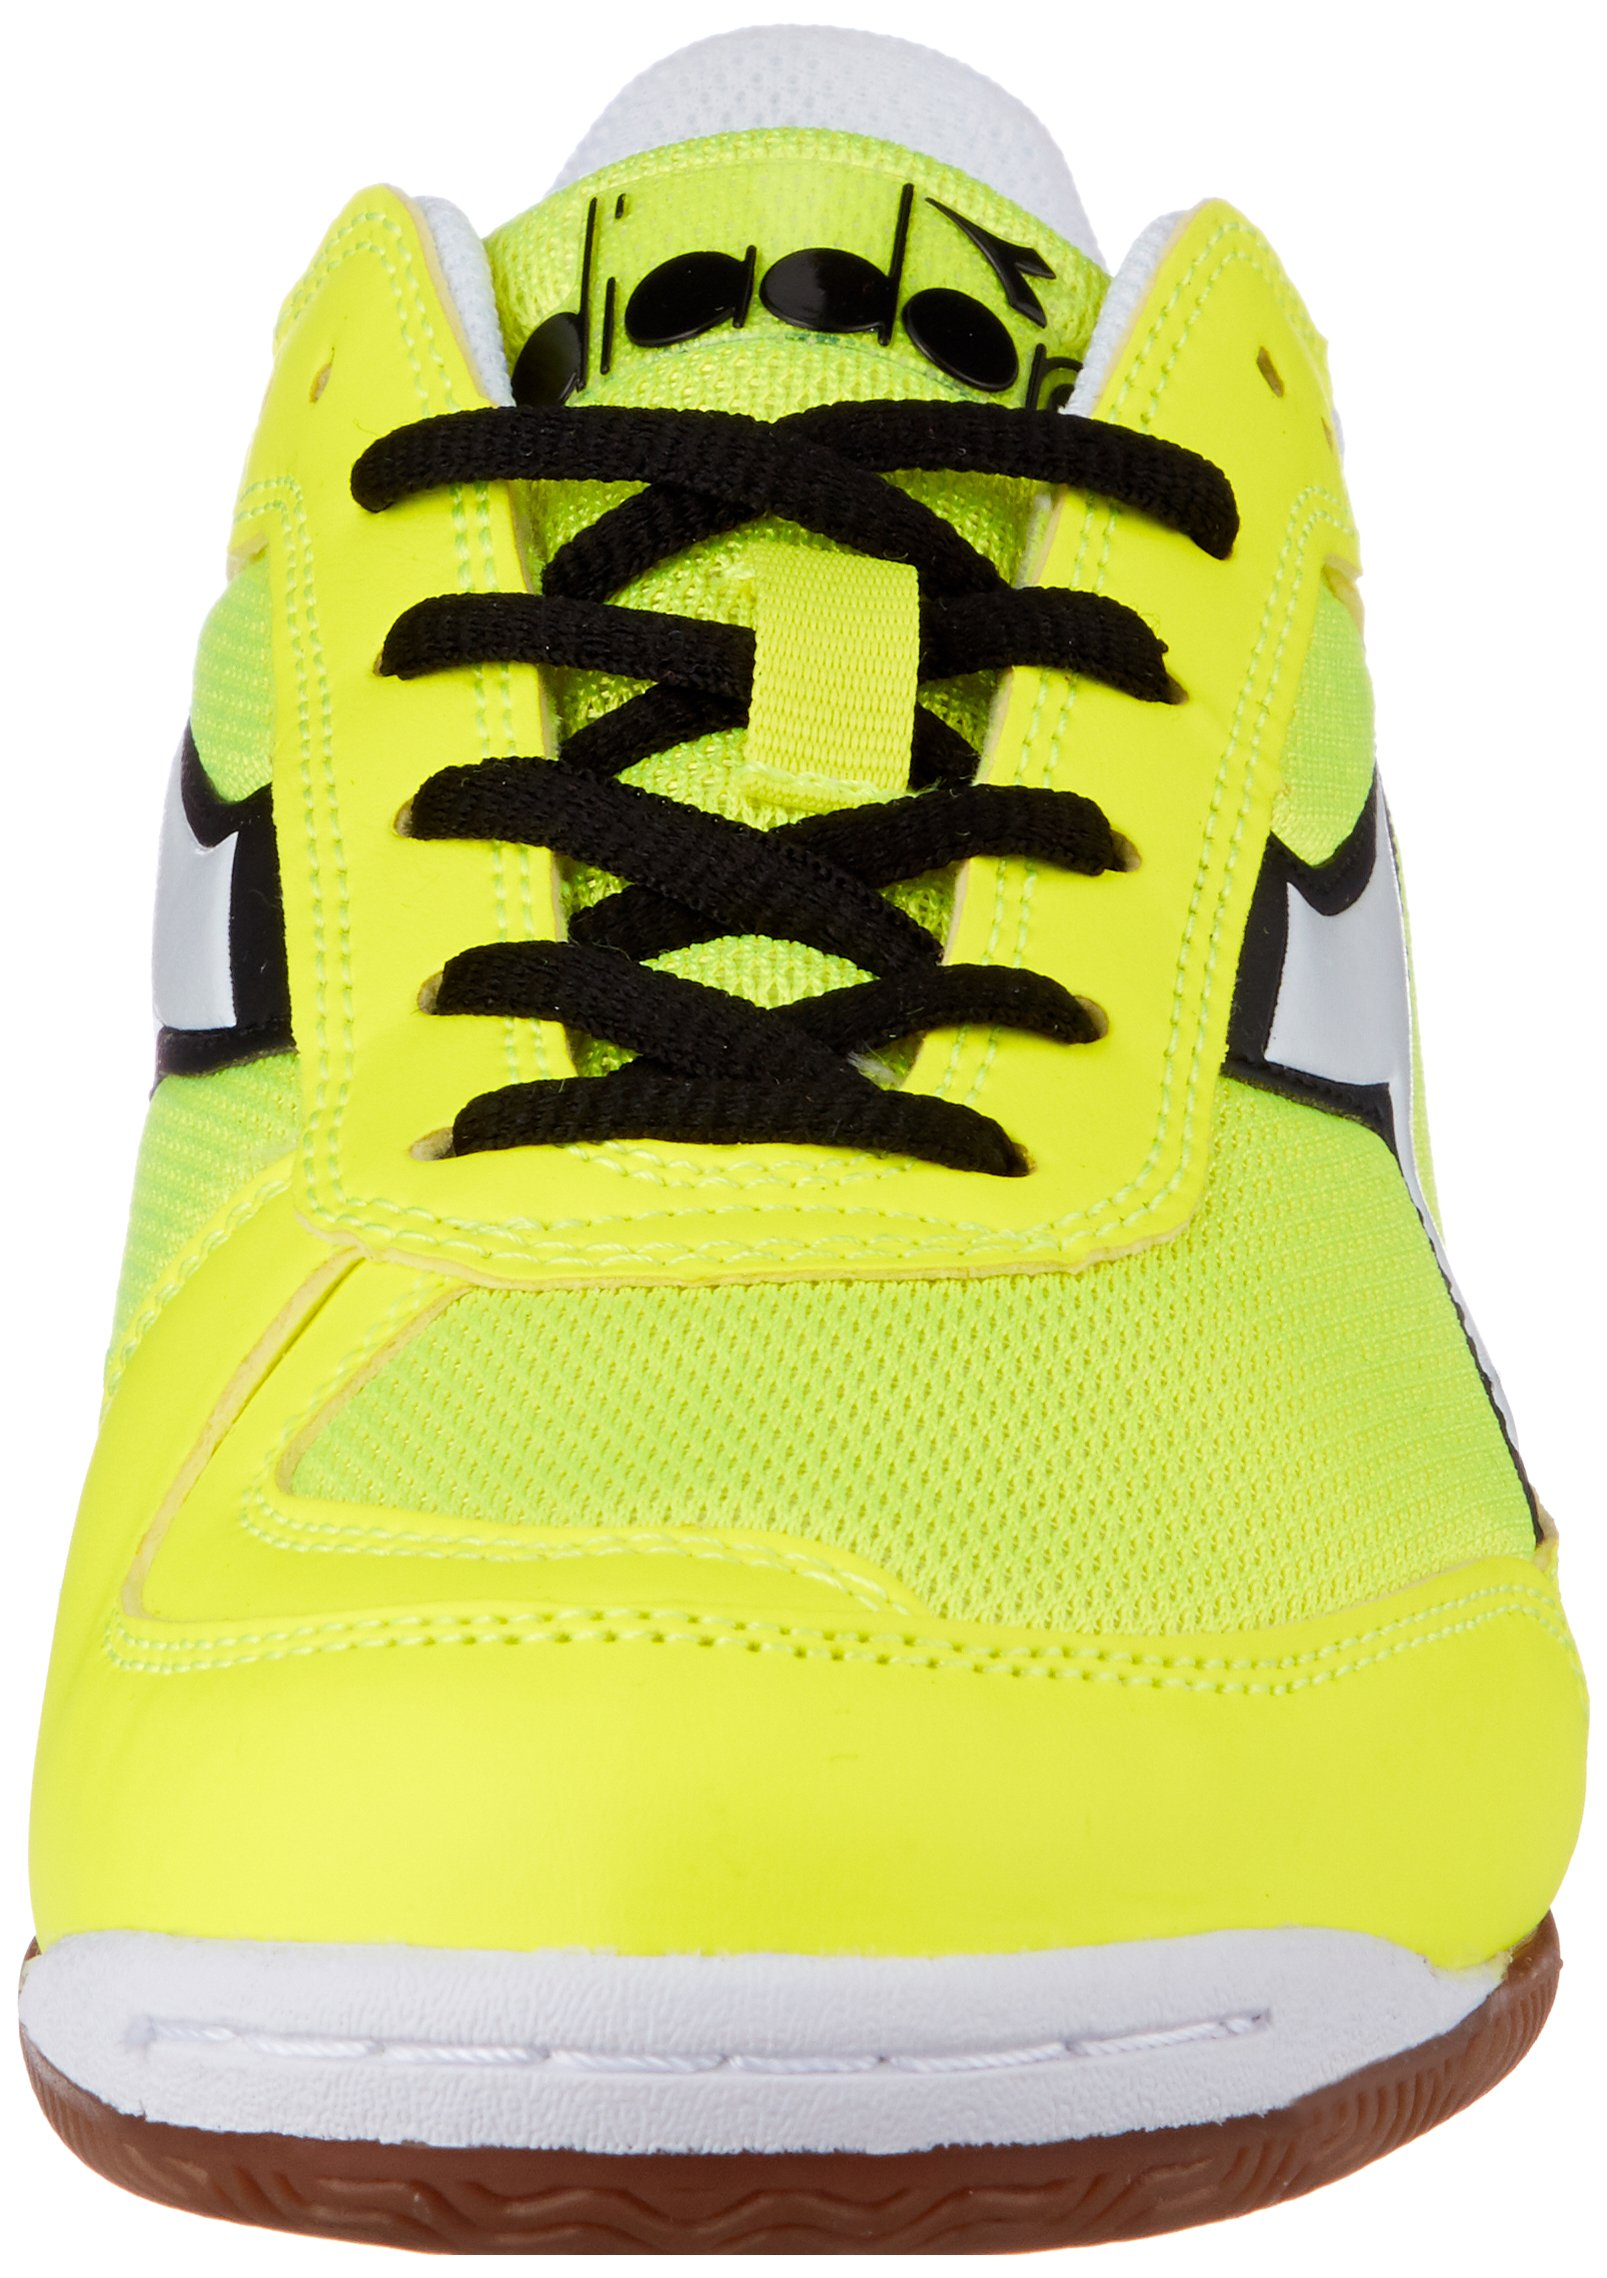 toxicity mirror straight ahead  Diadora Men's Cinquinha Id Futsal Shoes- Buy Online in Antigua and Barbuda  at Desertcart